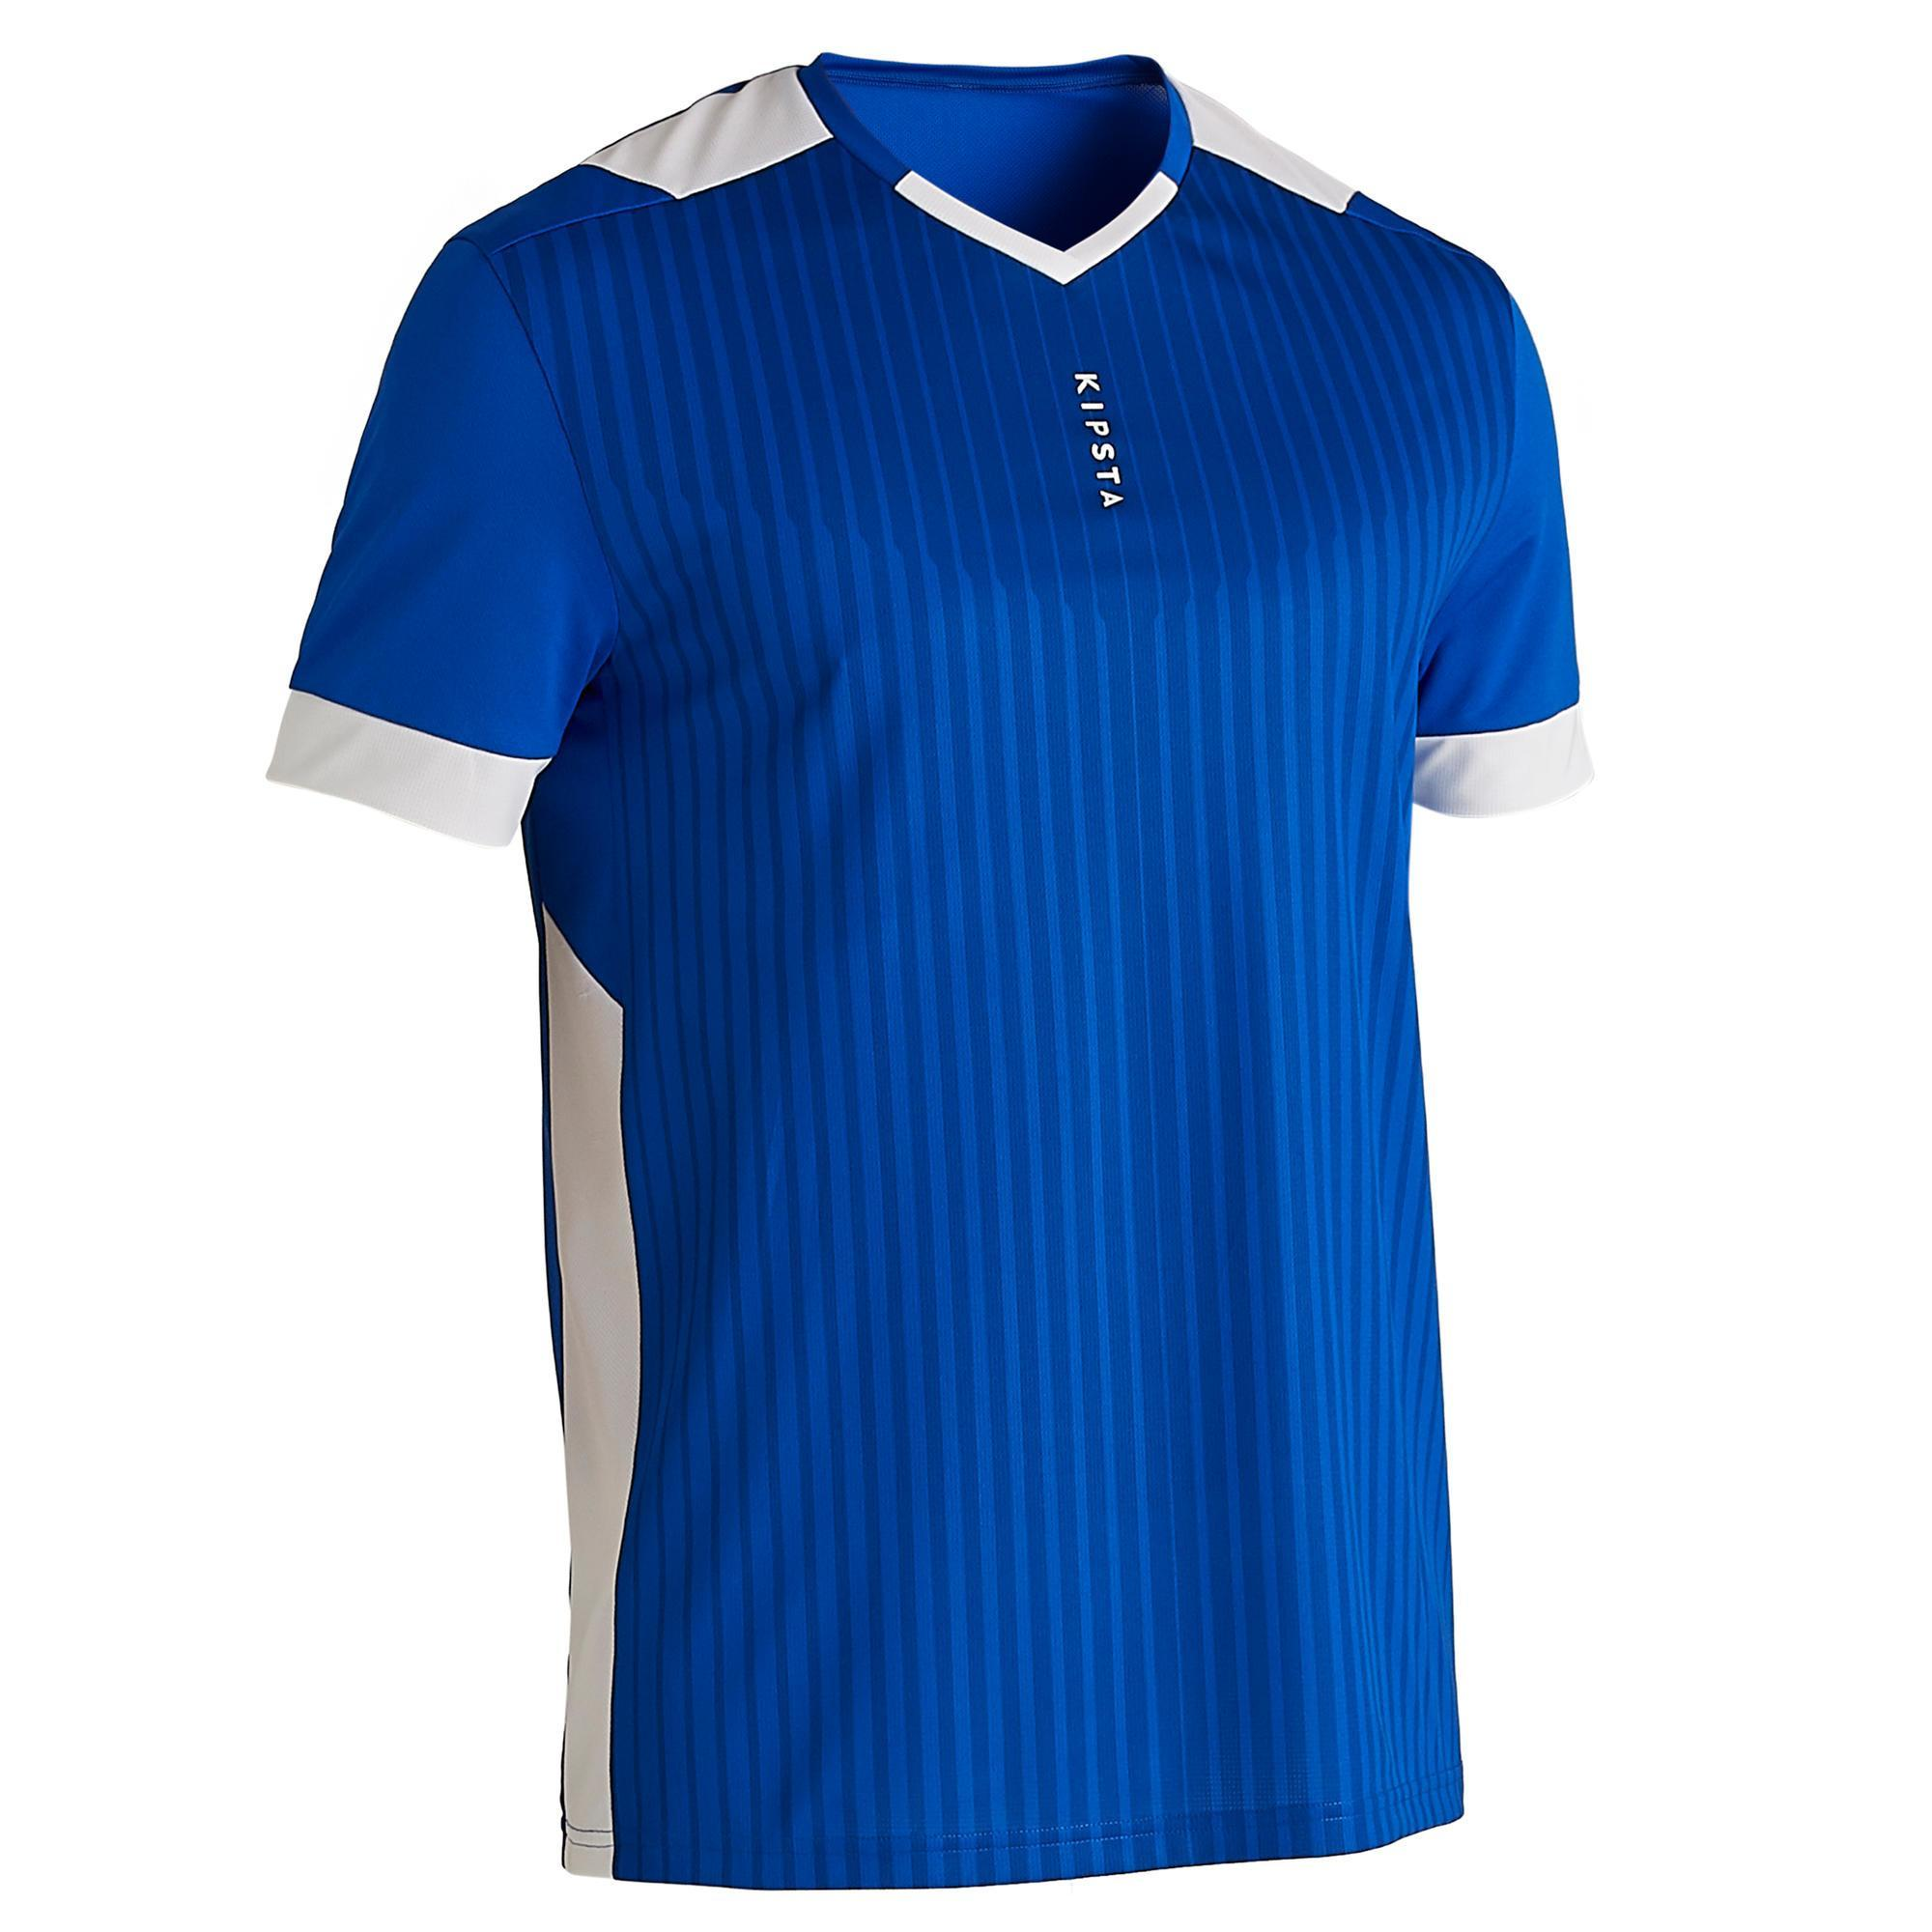 Kipsta Voetbalshirt F500